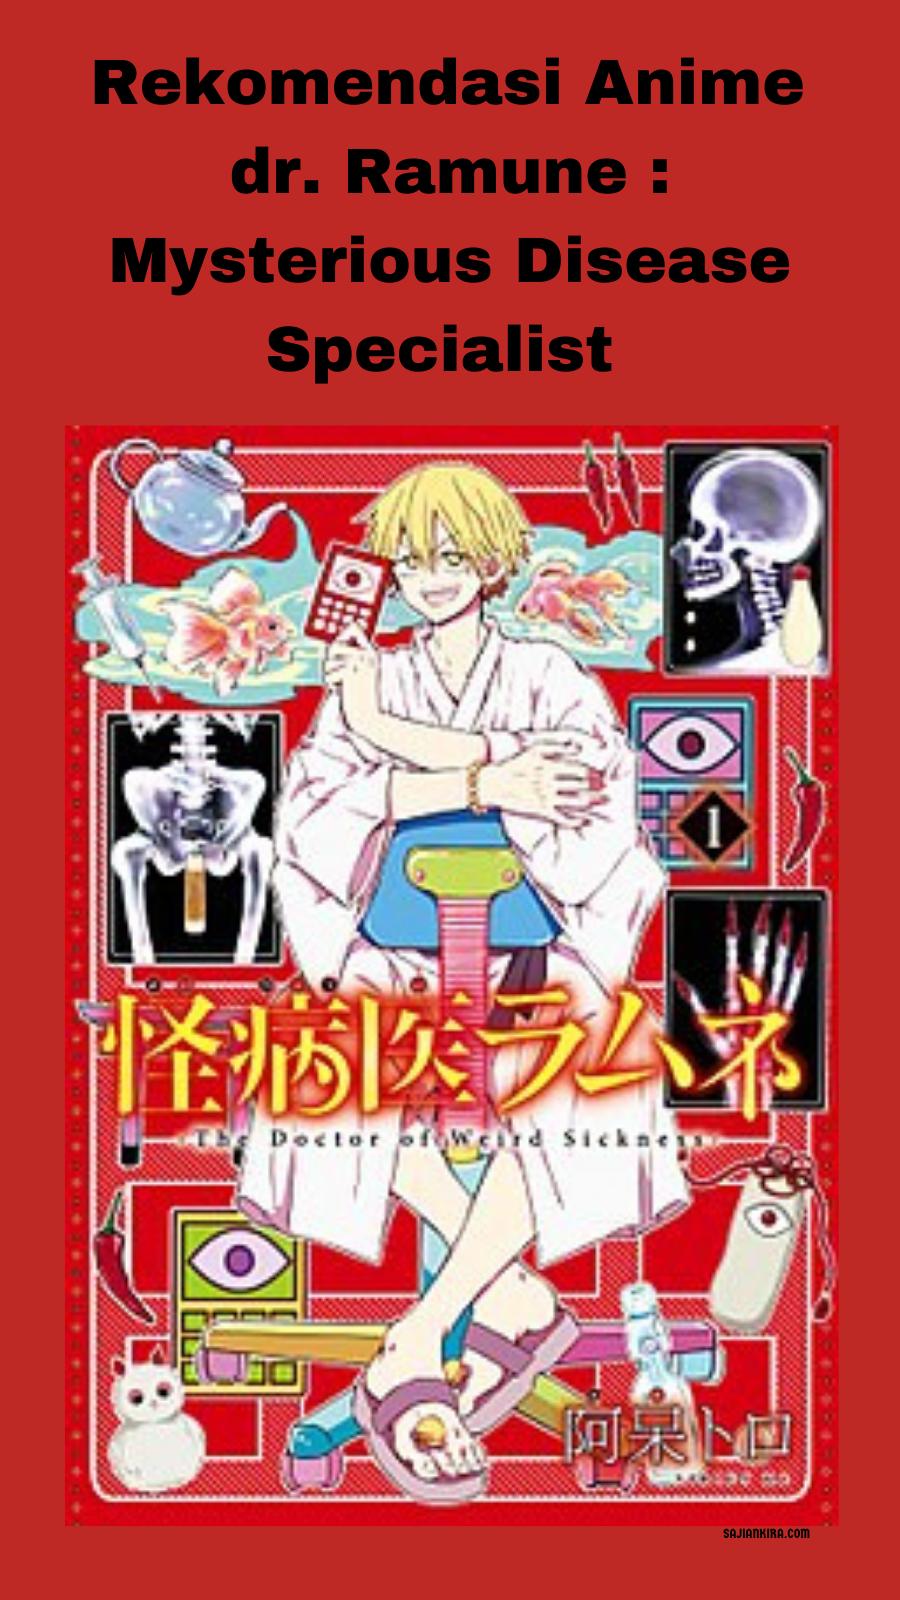 Rekomendasi-Anime-dr-Ramune-Mysterious-Disease-Specialist